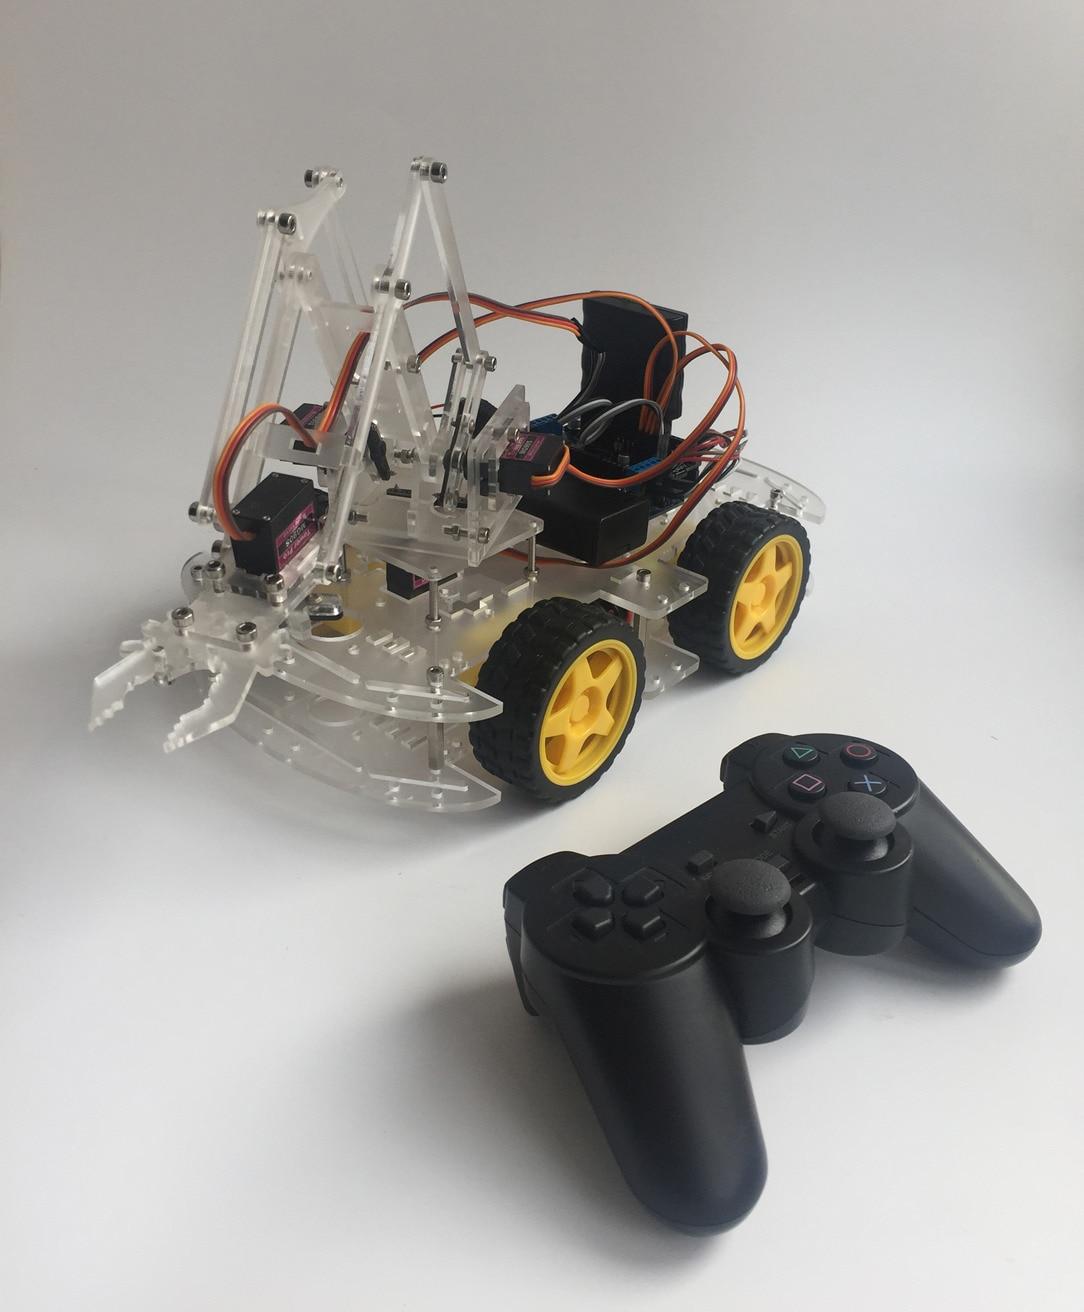 MeArm Raspberry Pie Robot Arm Intelligent Car Learning Kit Robot Graduation Design